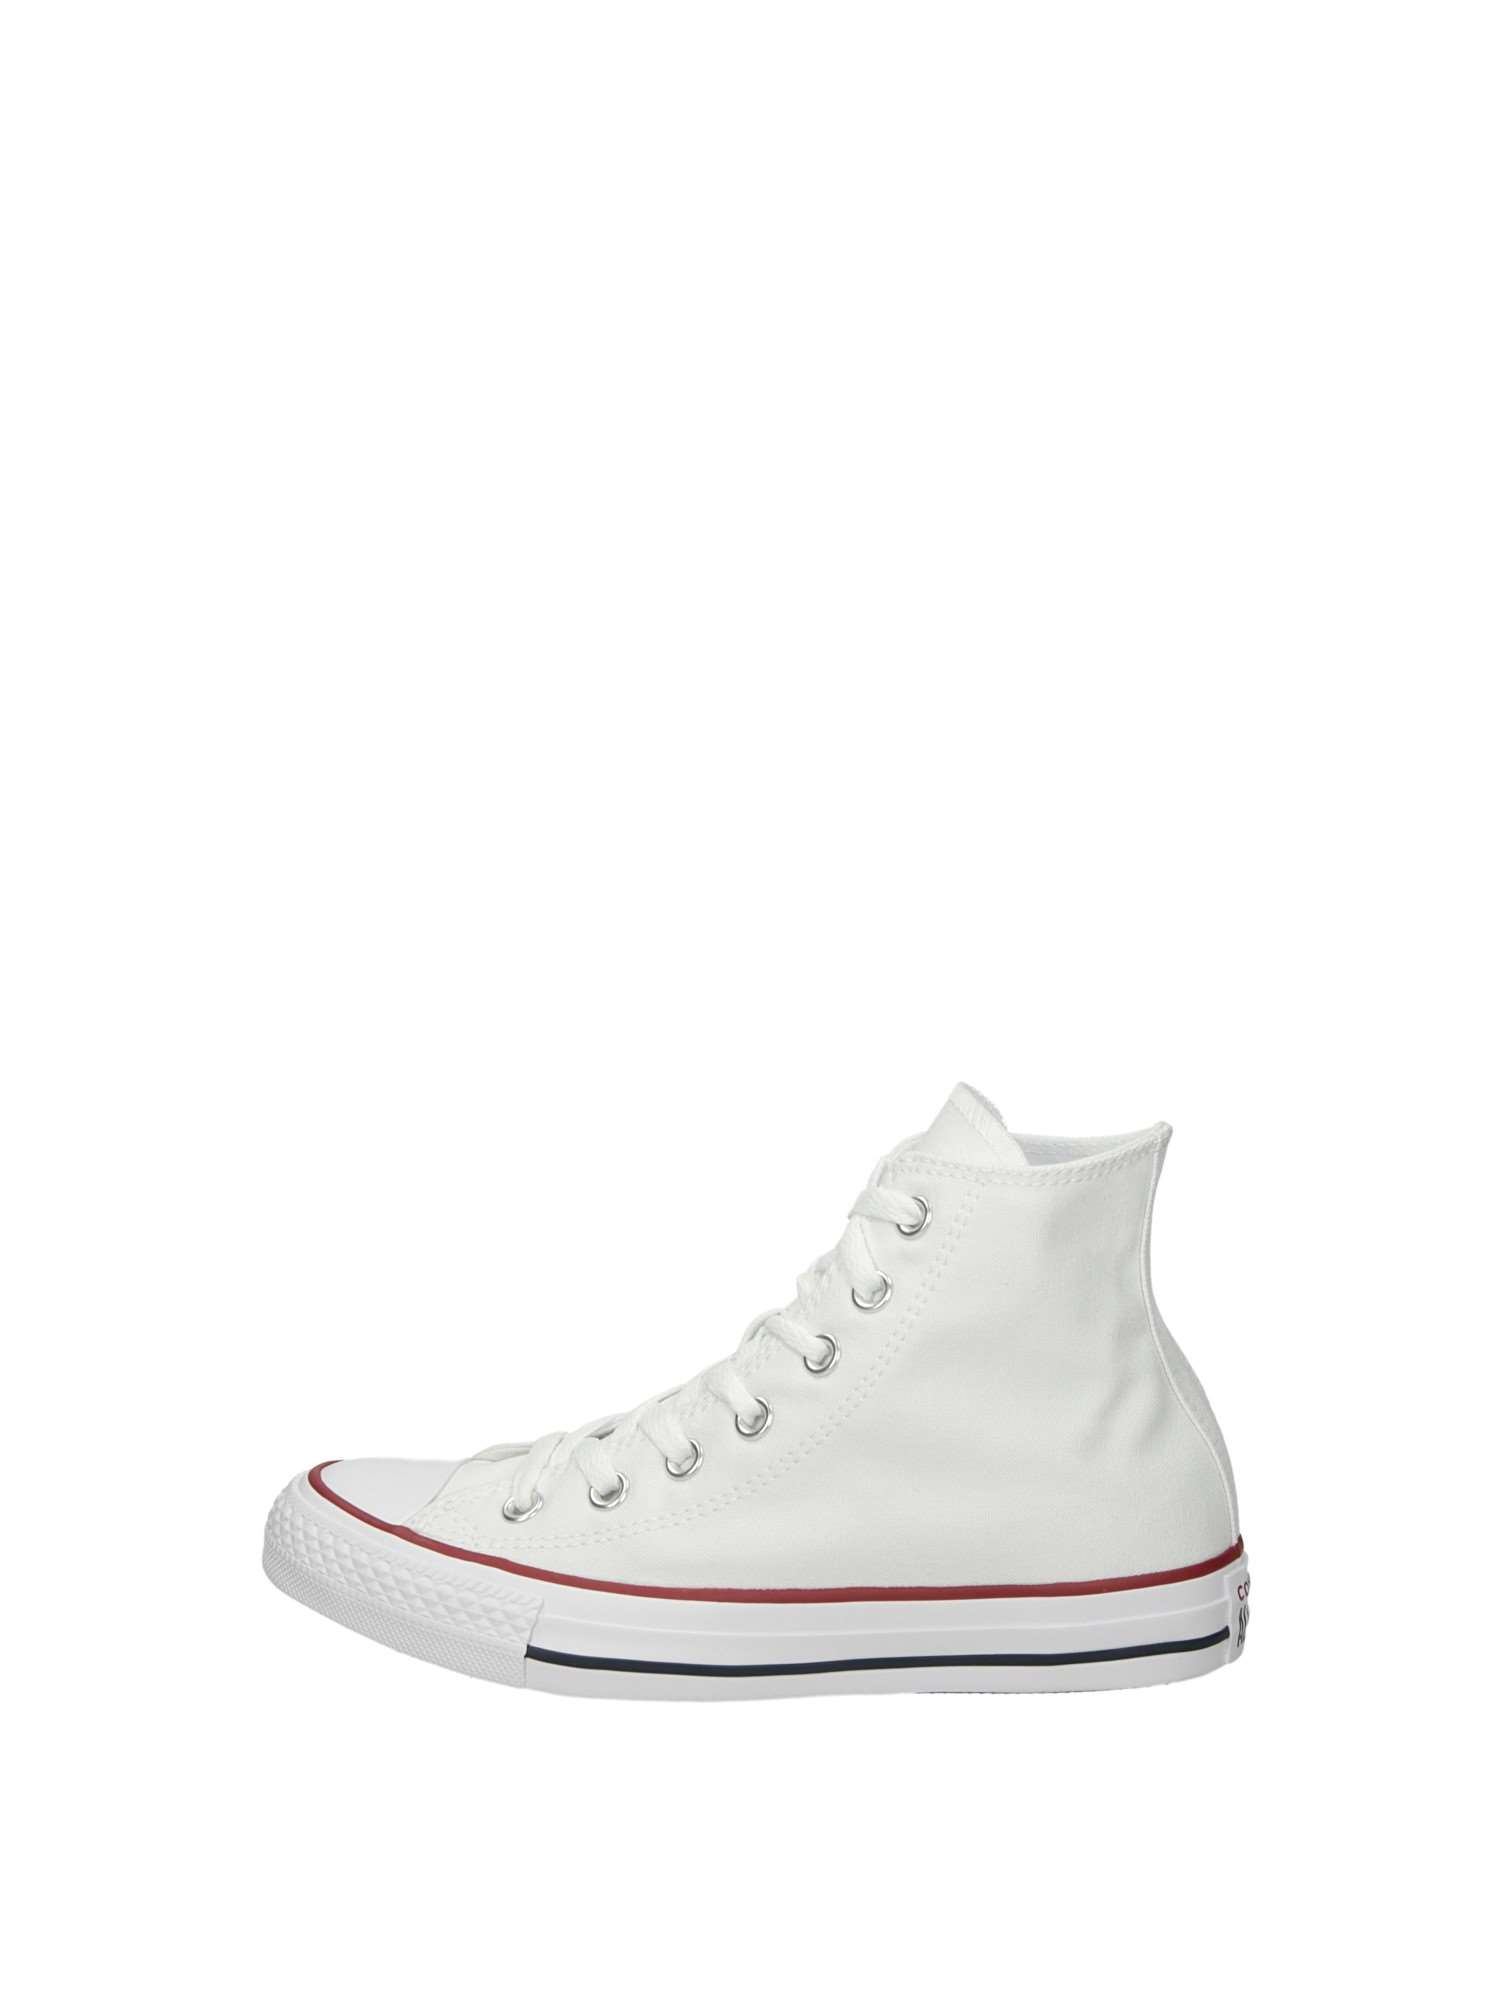 Converse Sneakers Alte Bambina Bianca   Lalilina